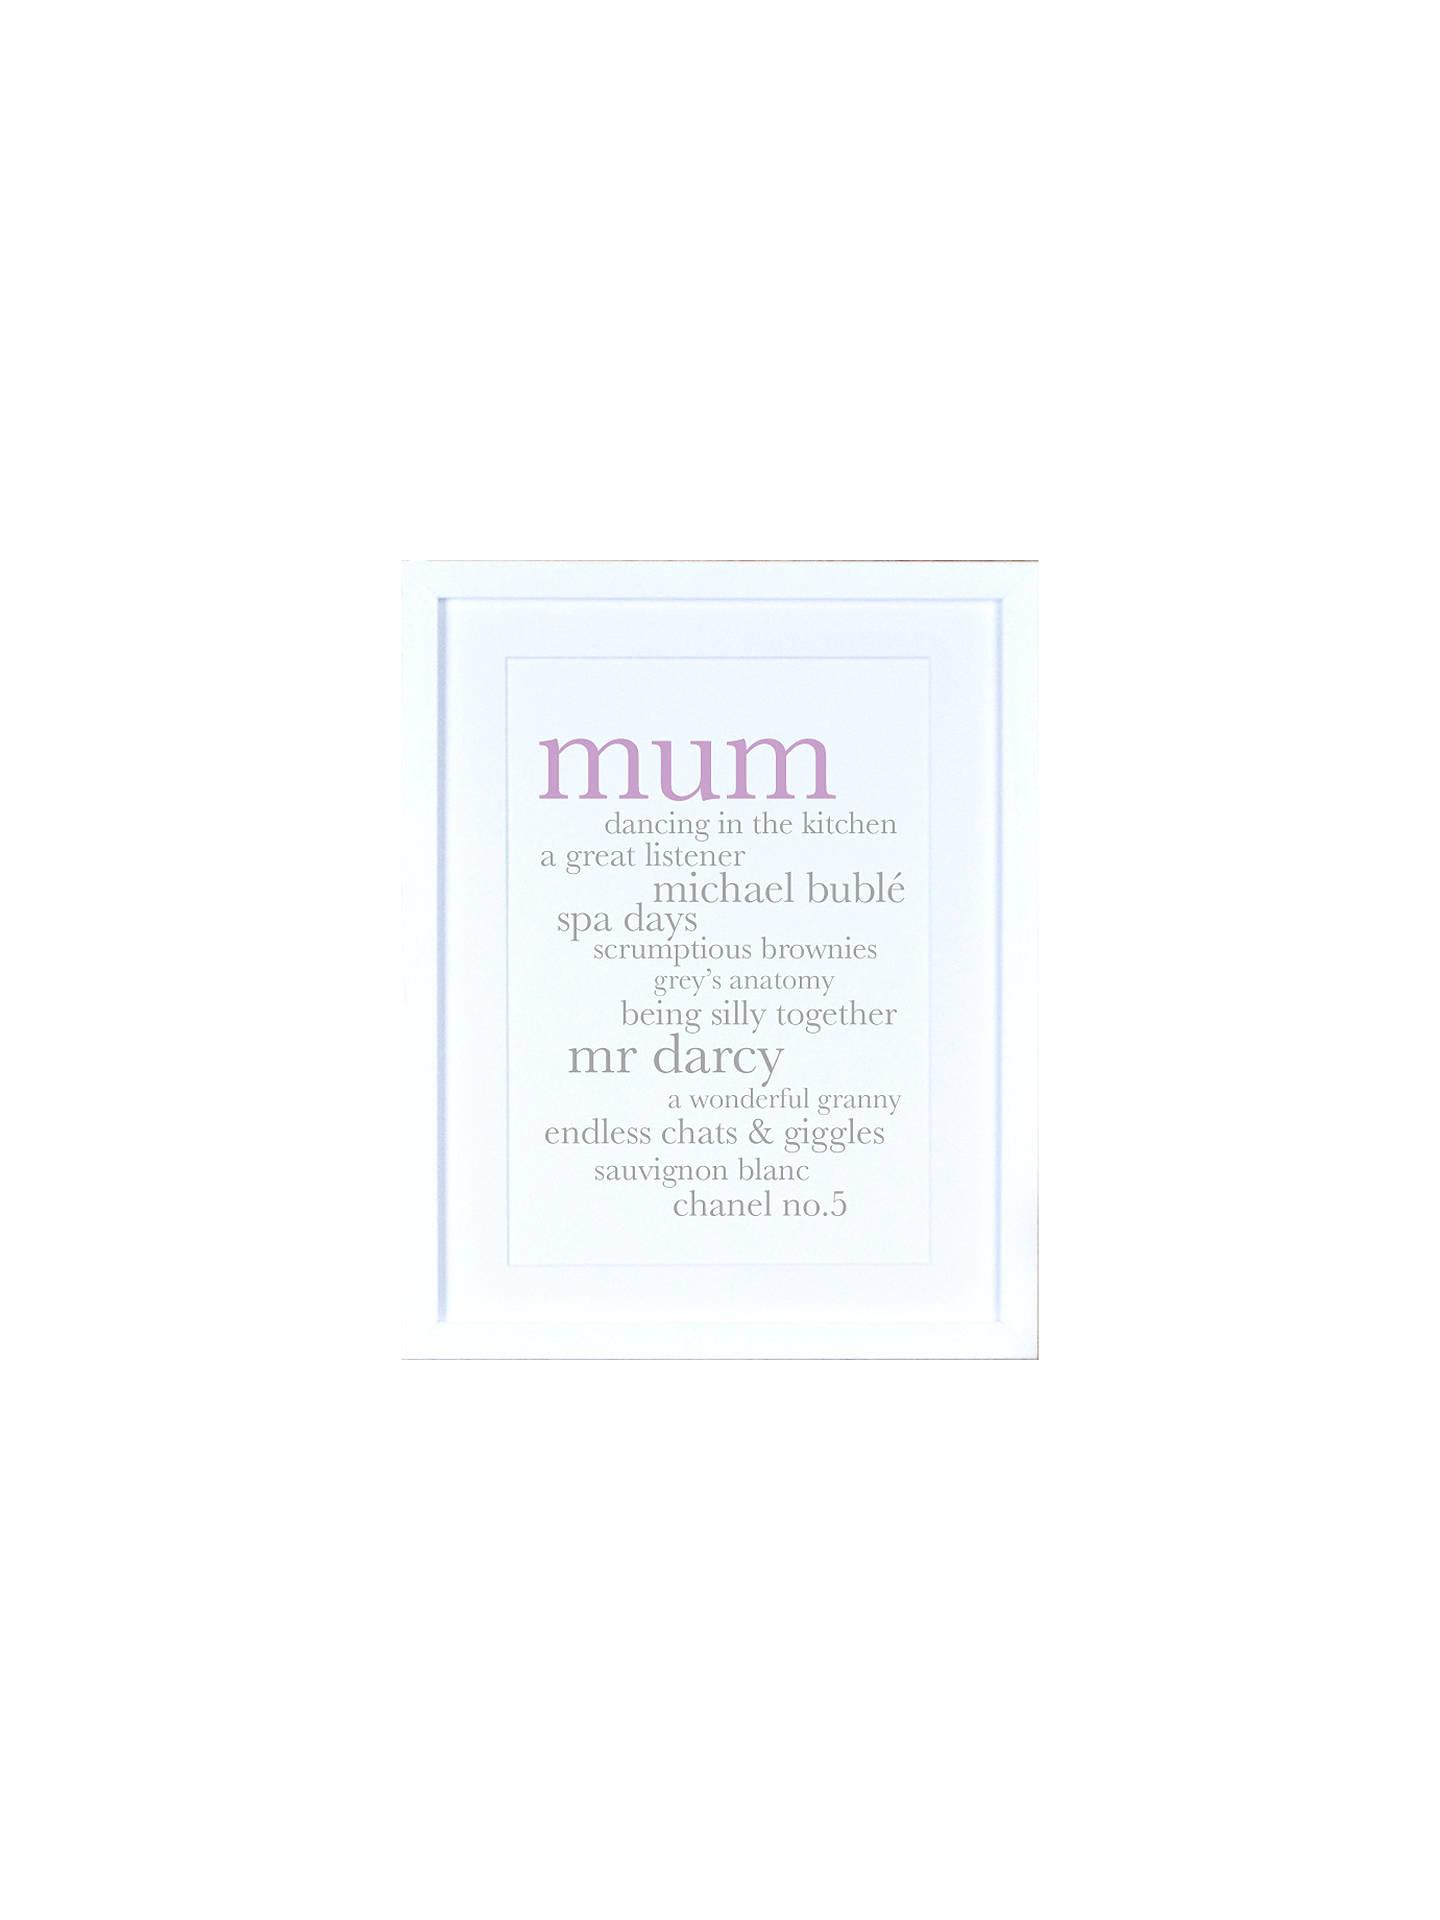 Personalised Definition Of Mum Print: Personalised Mum Definition Framed Print